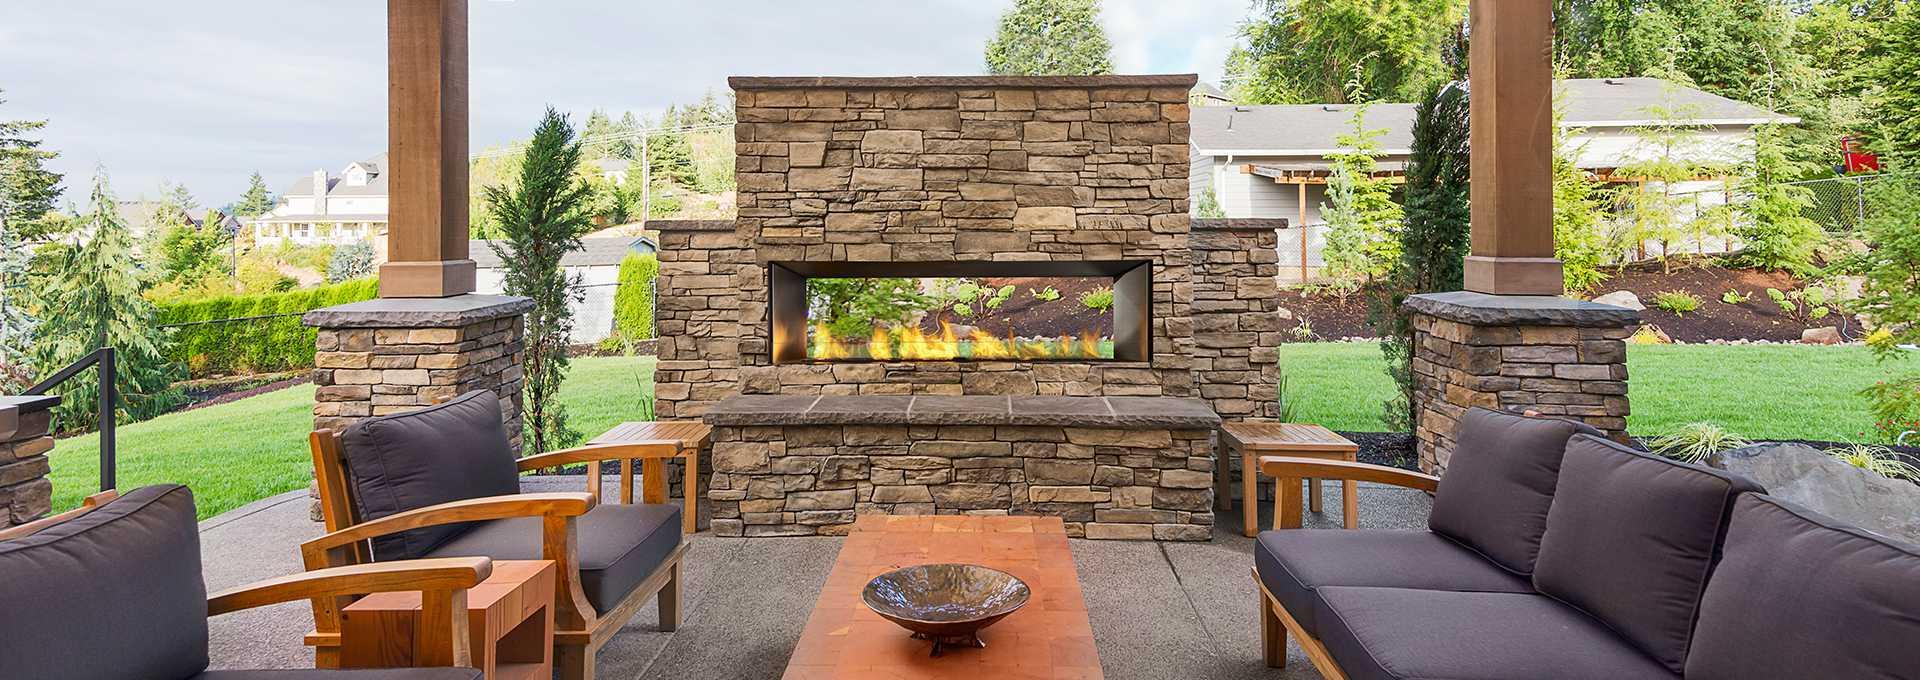 Regency Horizon HZO60 Outdoor Gas Fireplace   Toronto Best ... on Outdoor Gas Fireplace For Deck id=52471